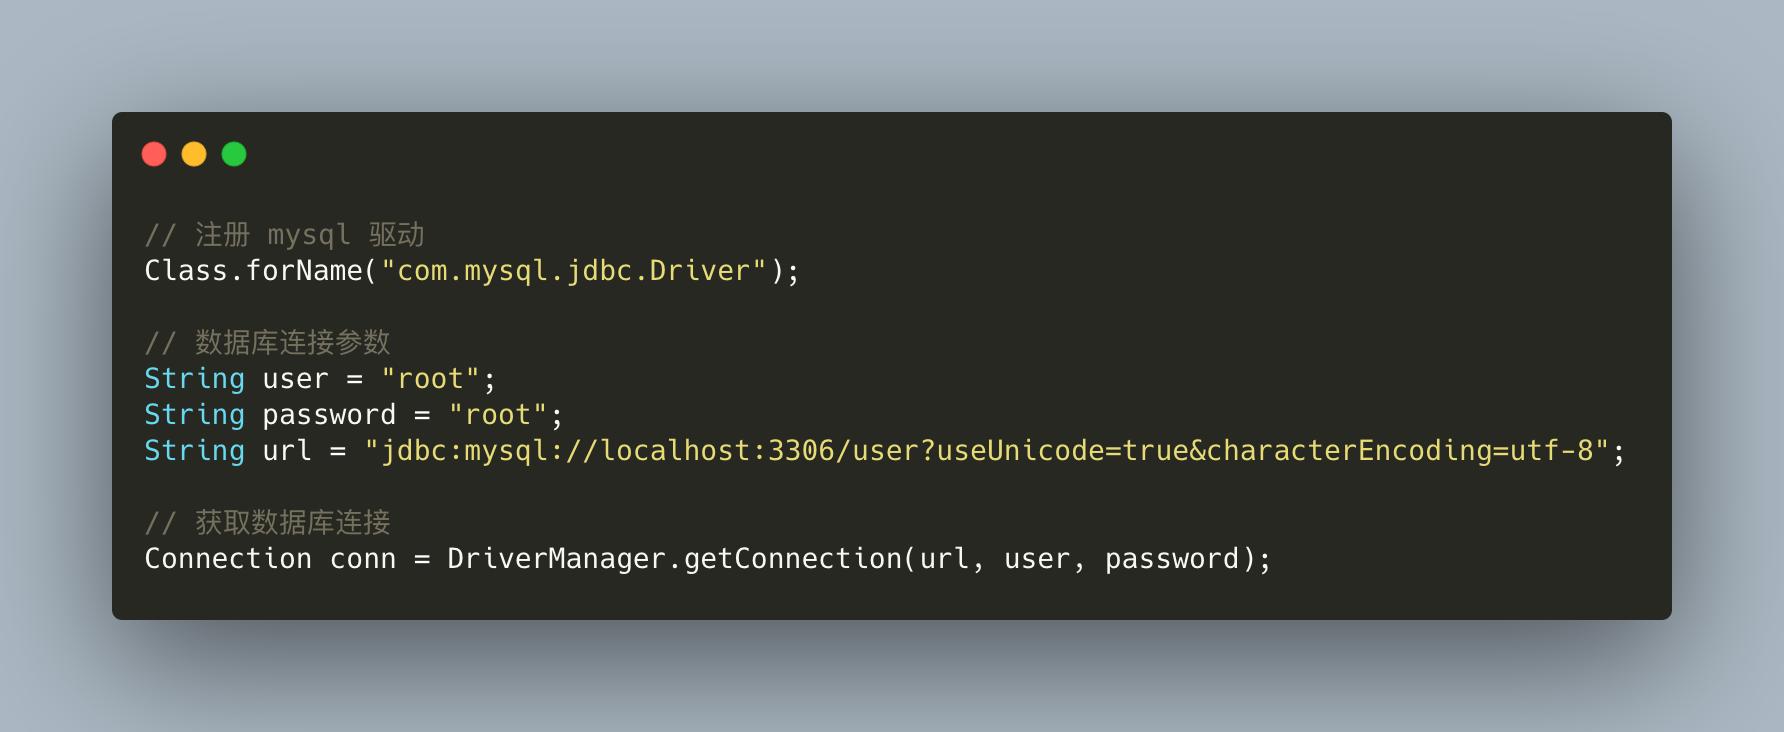 DataSource接口,一个被大多数程序员忽略的接口